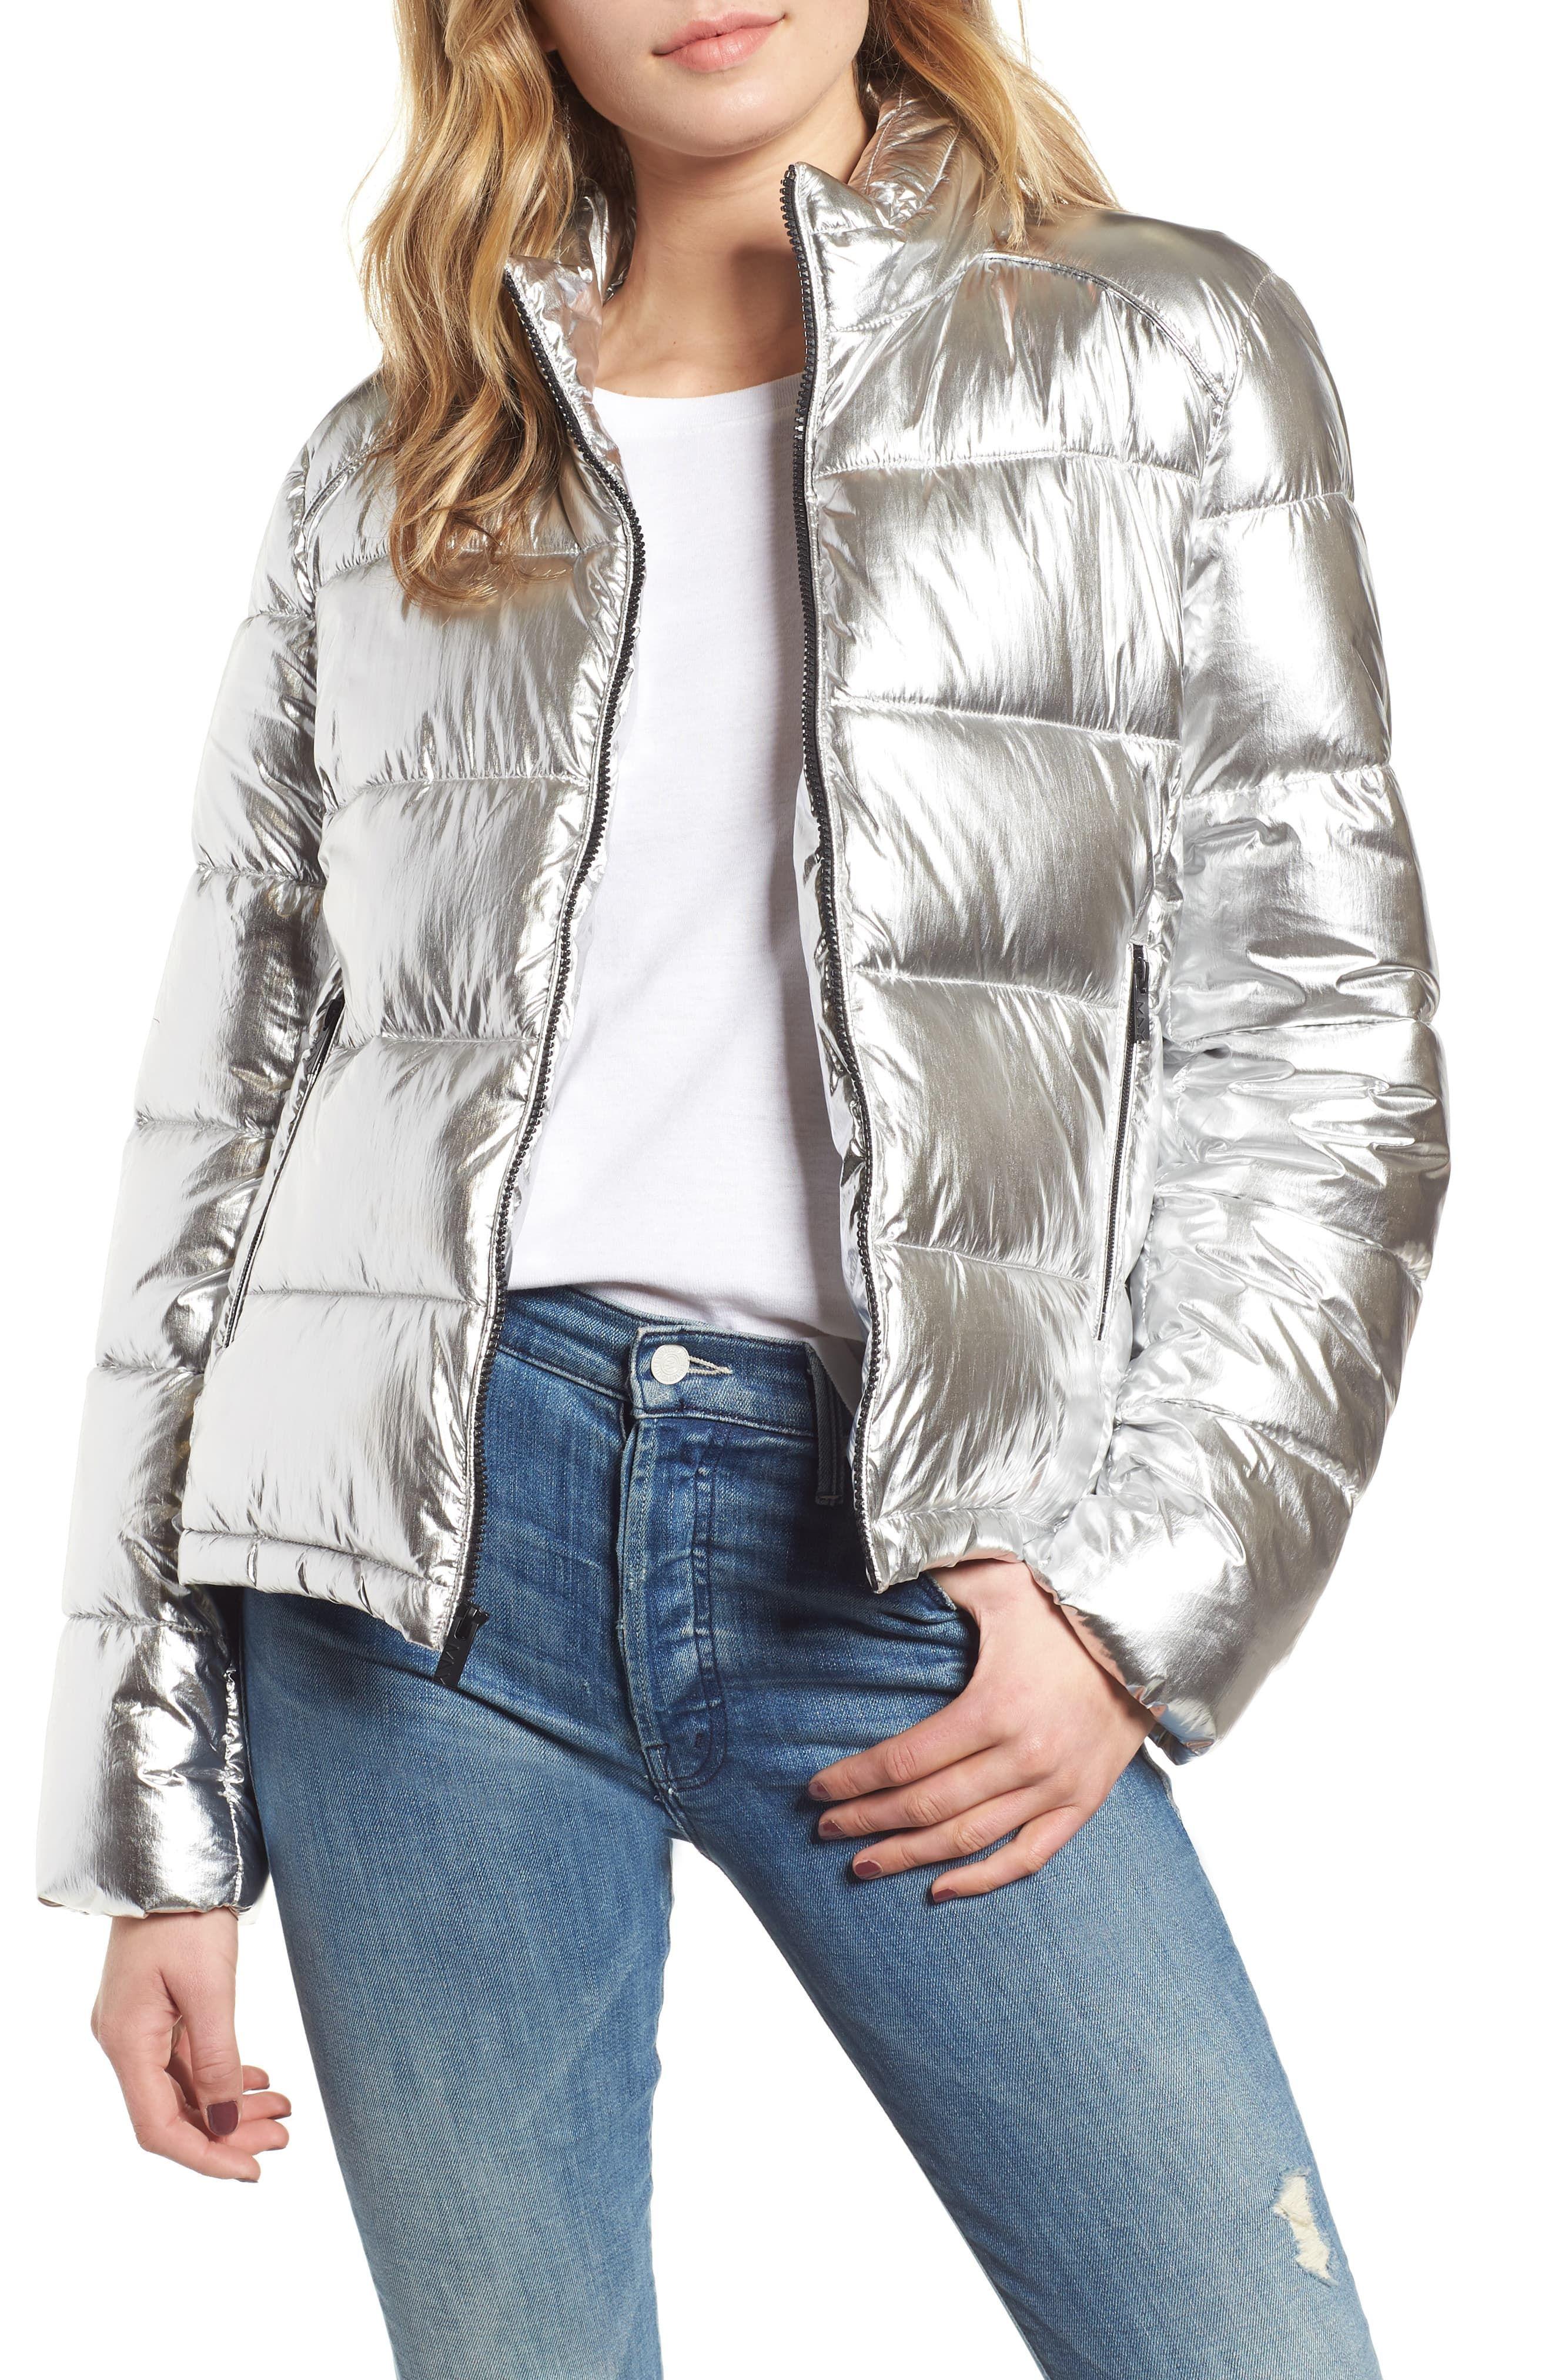 Marc New York Metallic Puffer Jacket Nordstrom Puffer Jacket Outfit Silver Puffer Jacket Silver Jacket Outfit [ 4048 x 2640 Pixel ]